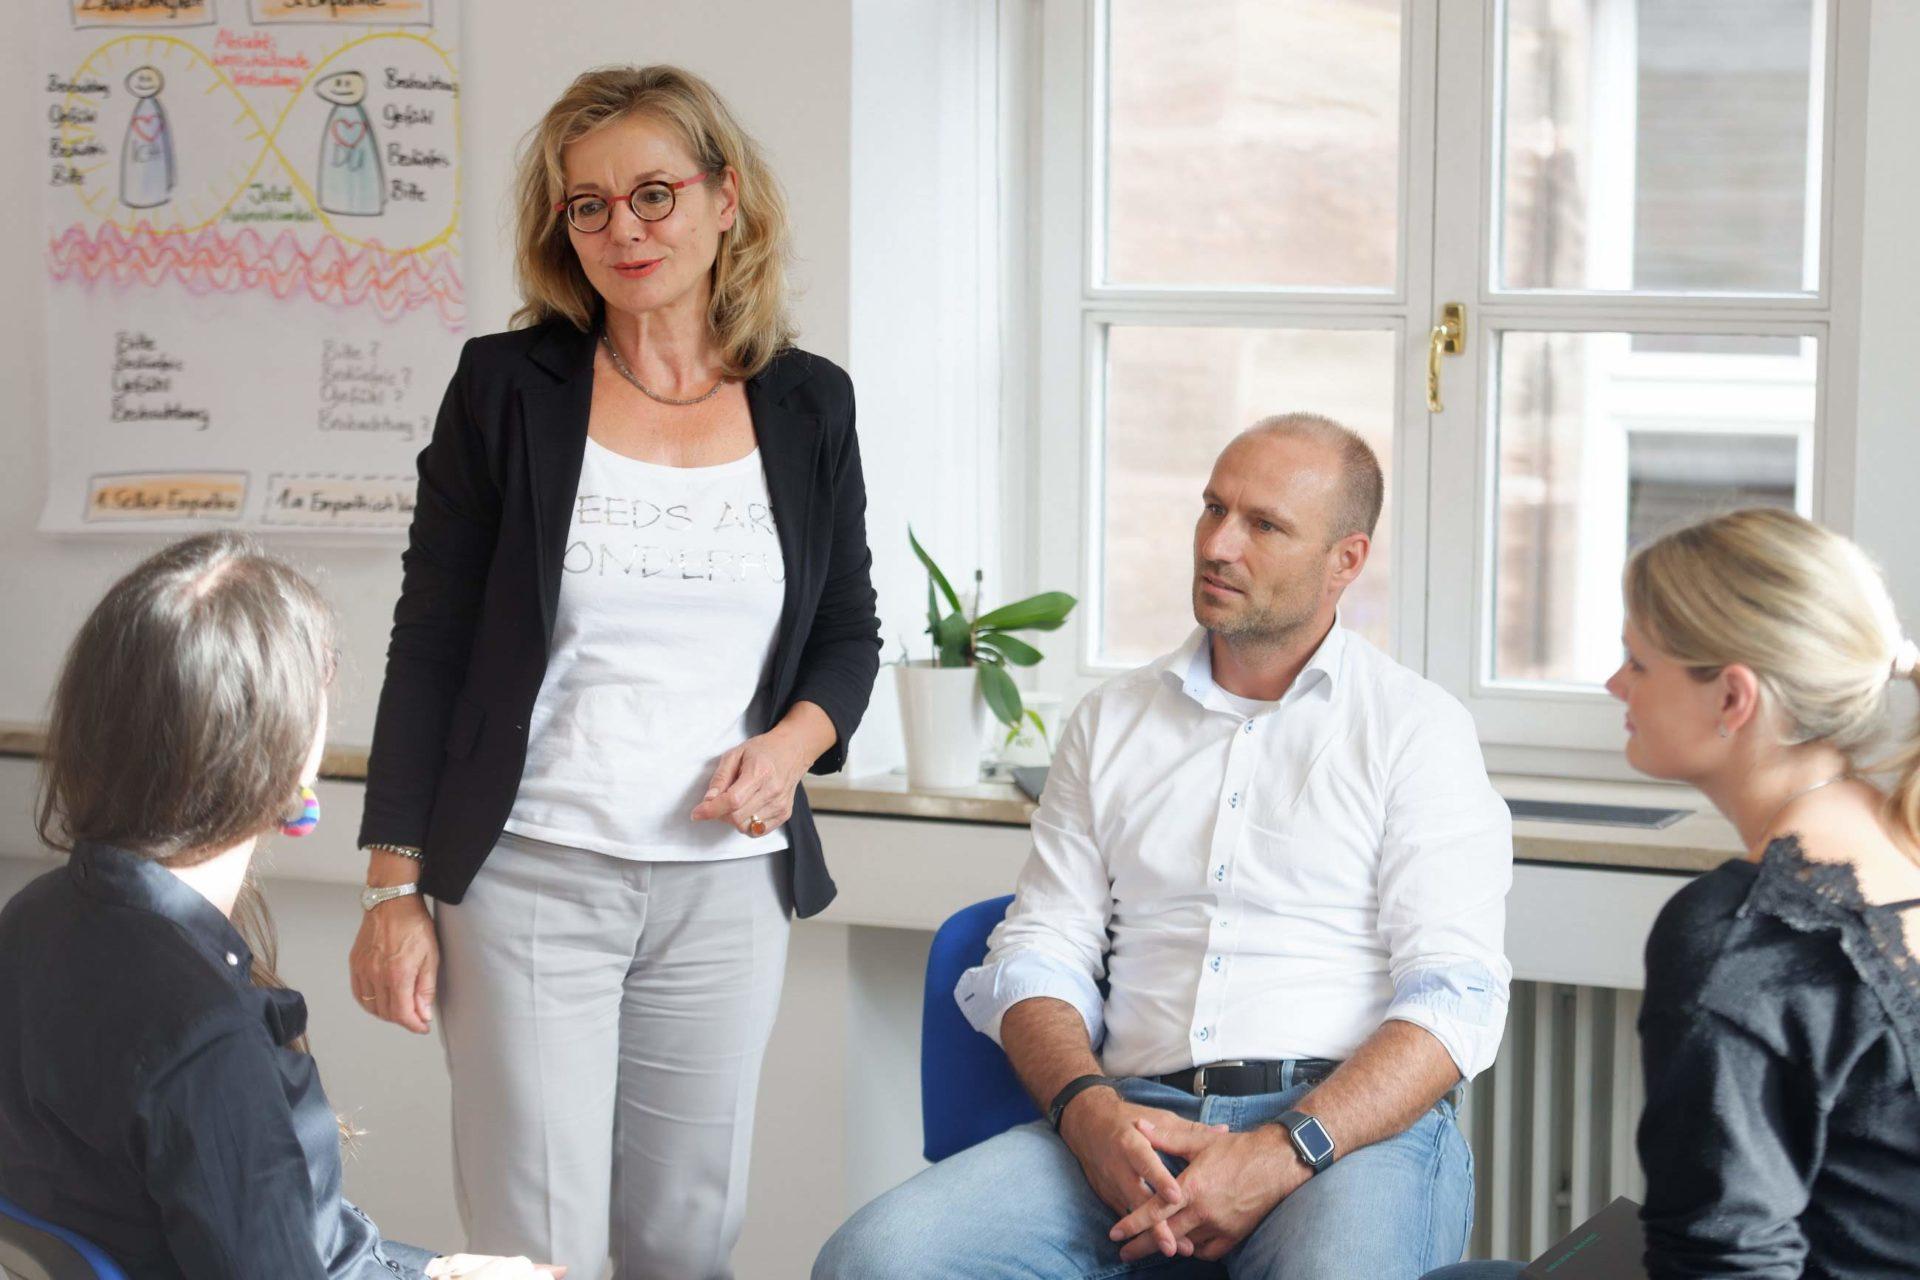 Gewaltfreie Kommunikation GFK Ausbildung Jahrestraining Nürnberg